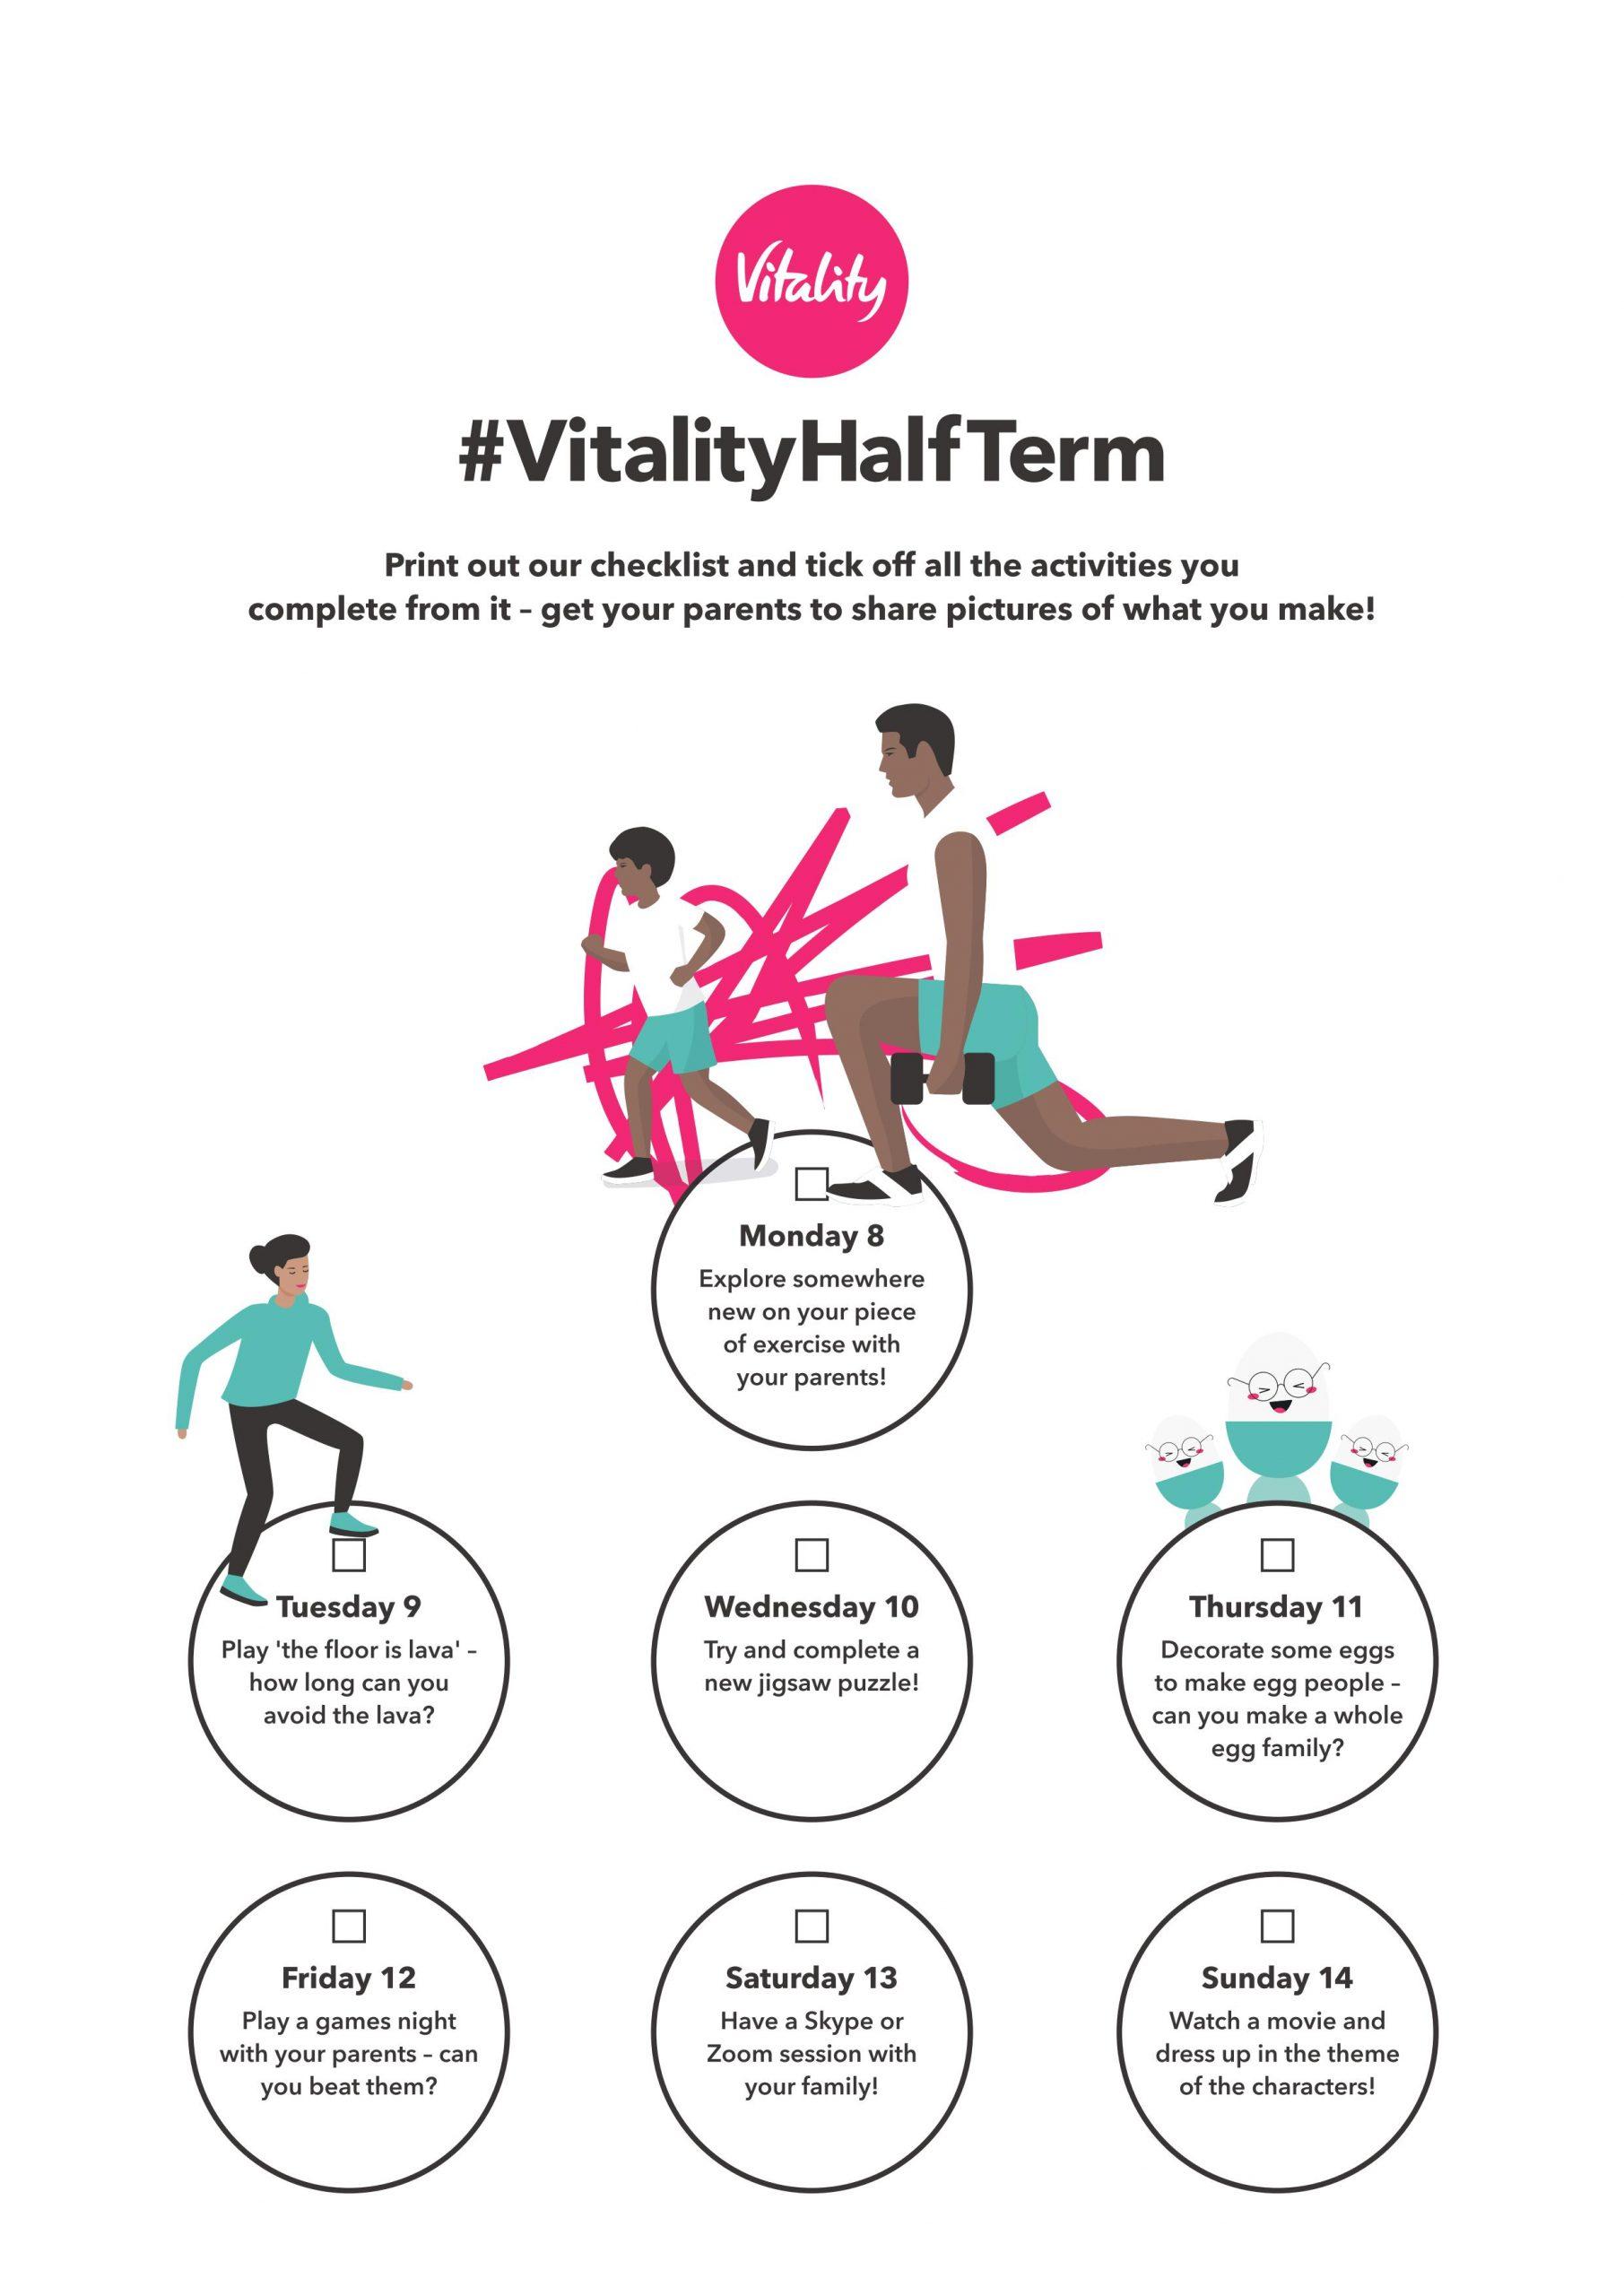 Vitality Kid's checklist week 1